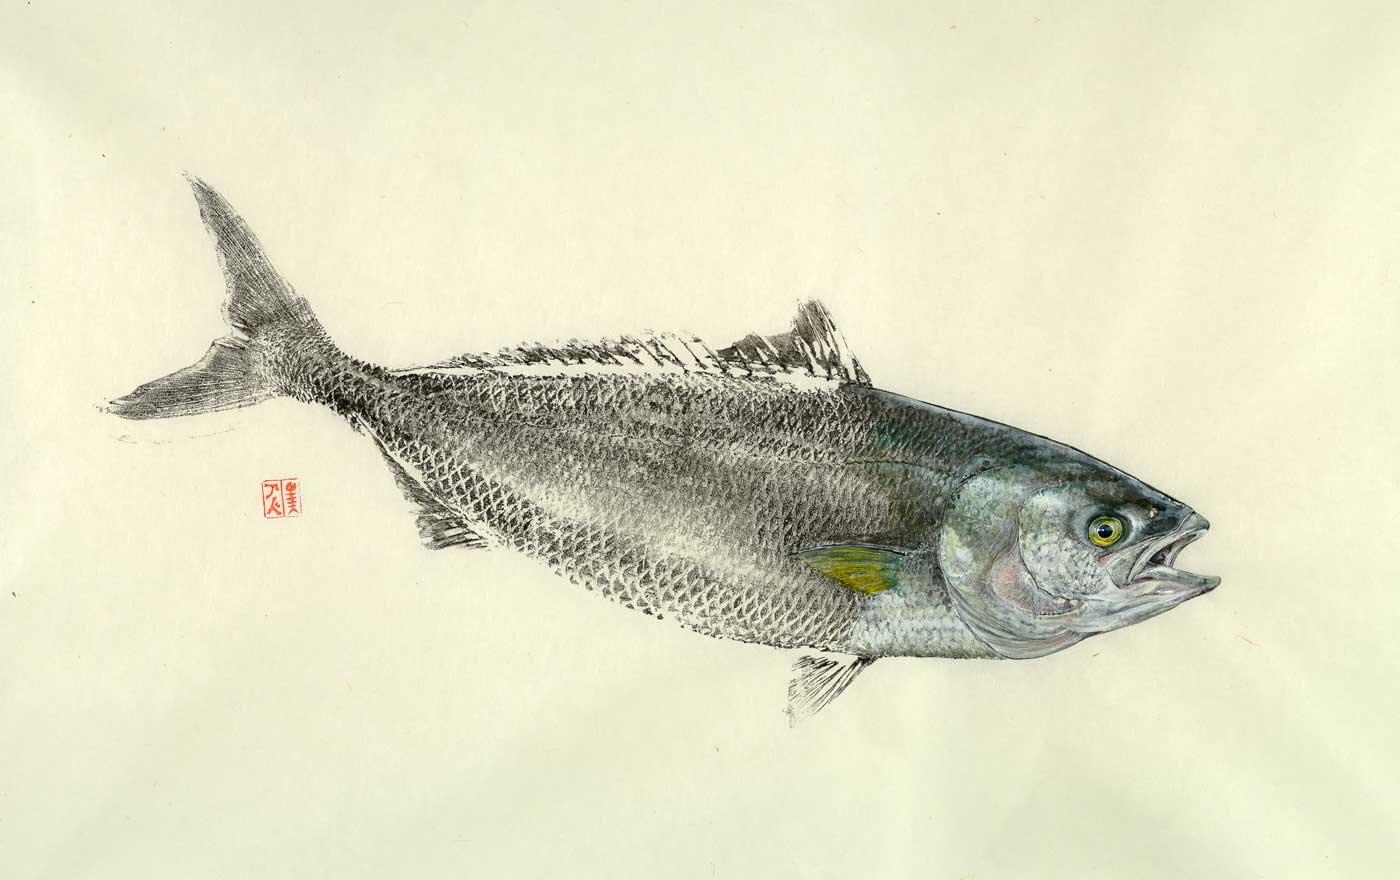 Adam-Ashdown-Australian-Salmon-2019-sumi-and-acrylic-on-kozo-90cm-x-65cm.jpg